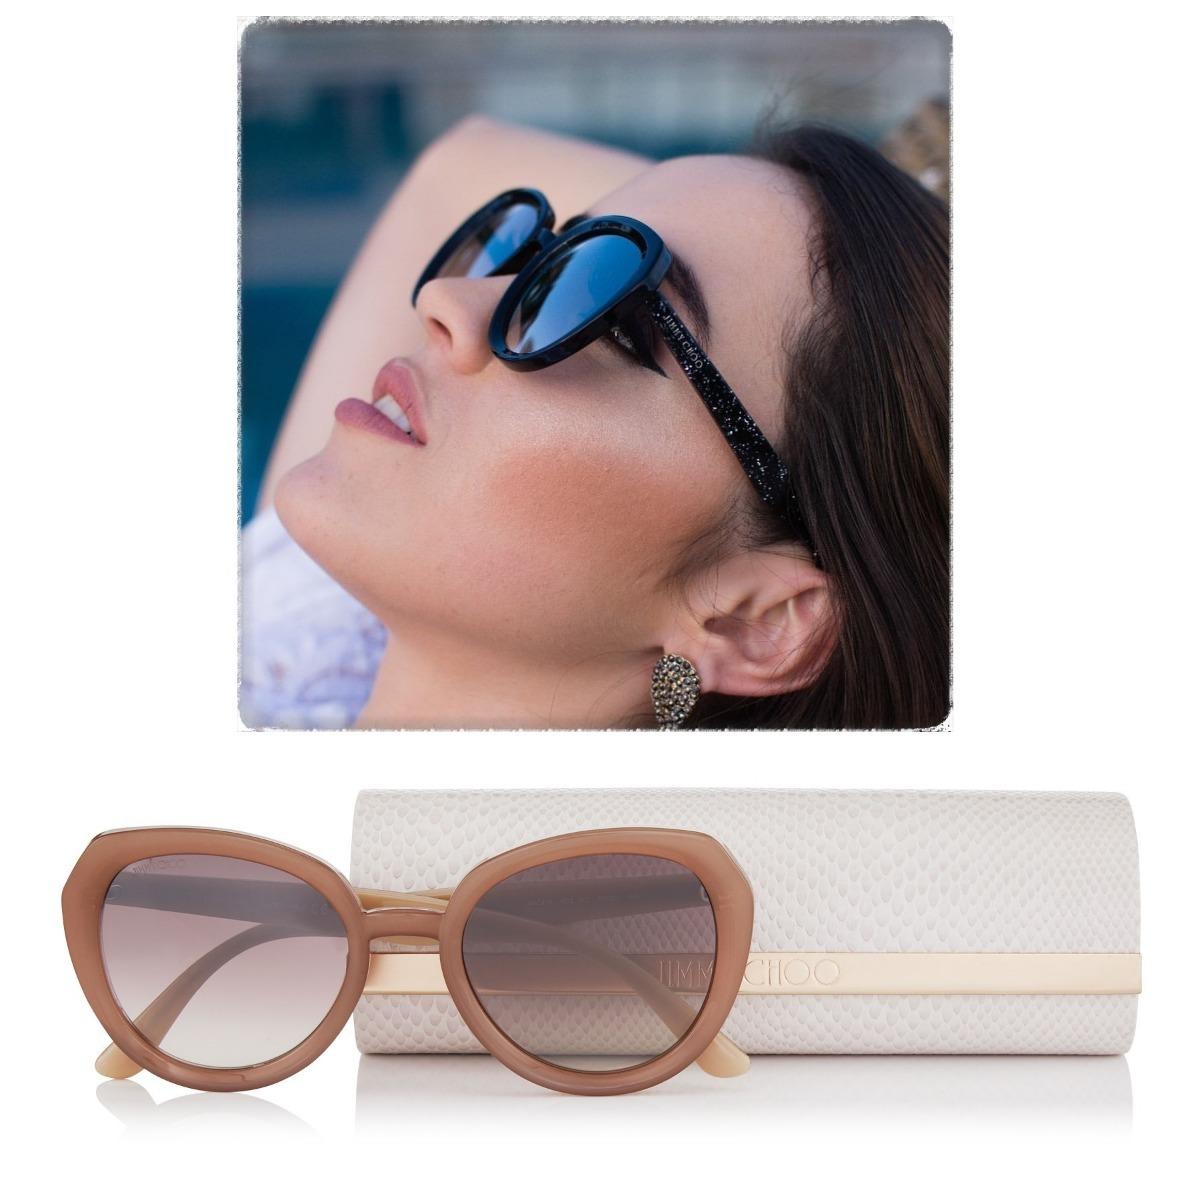 26936a686 Óculos De Sol Jimmy Choo Mace Round Lançamento Glitter - R$ 499,00 ...